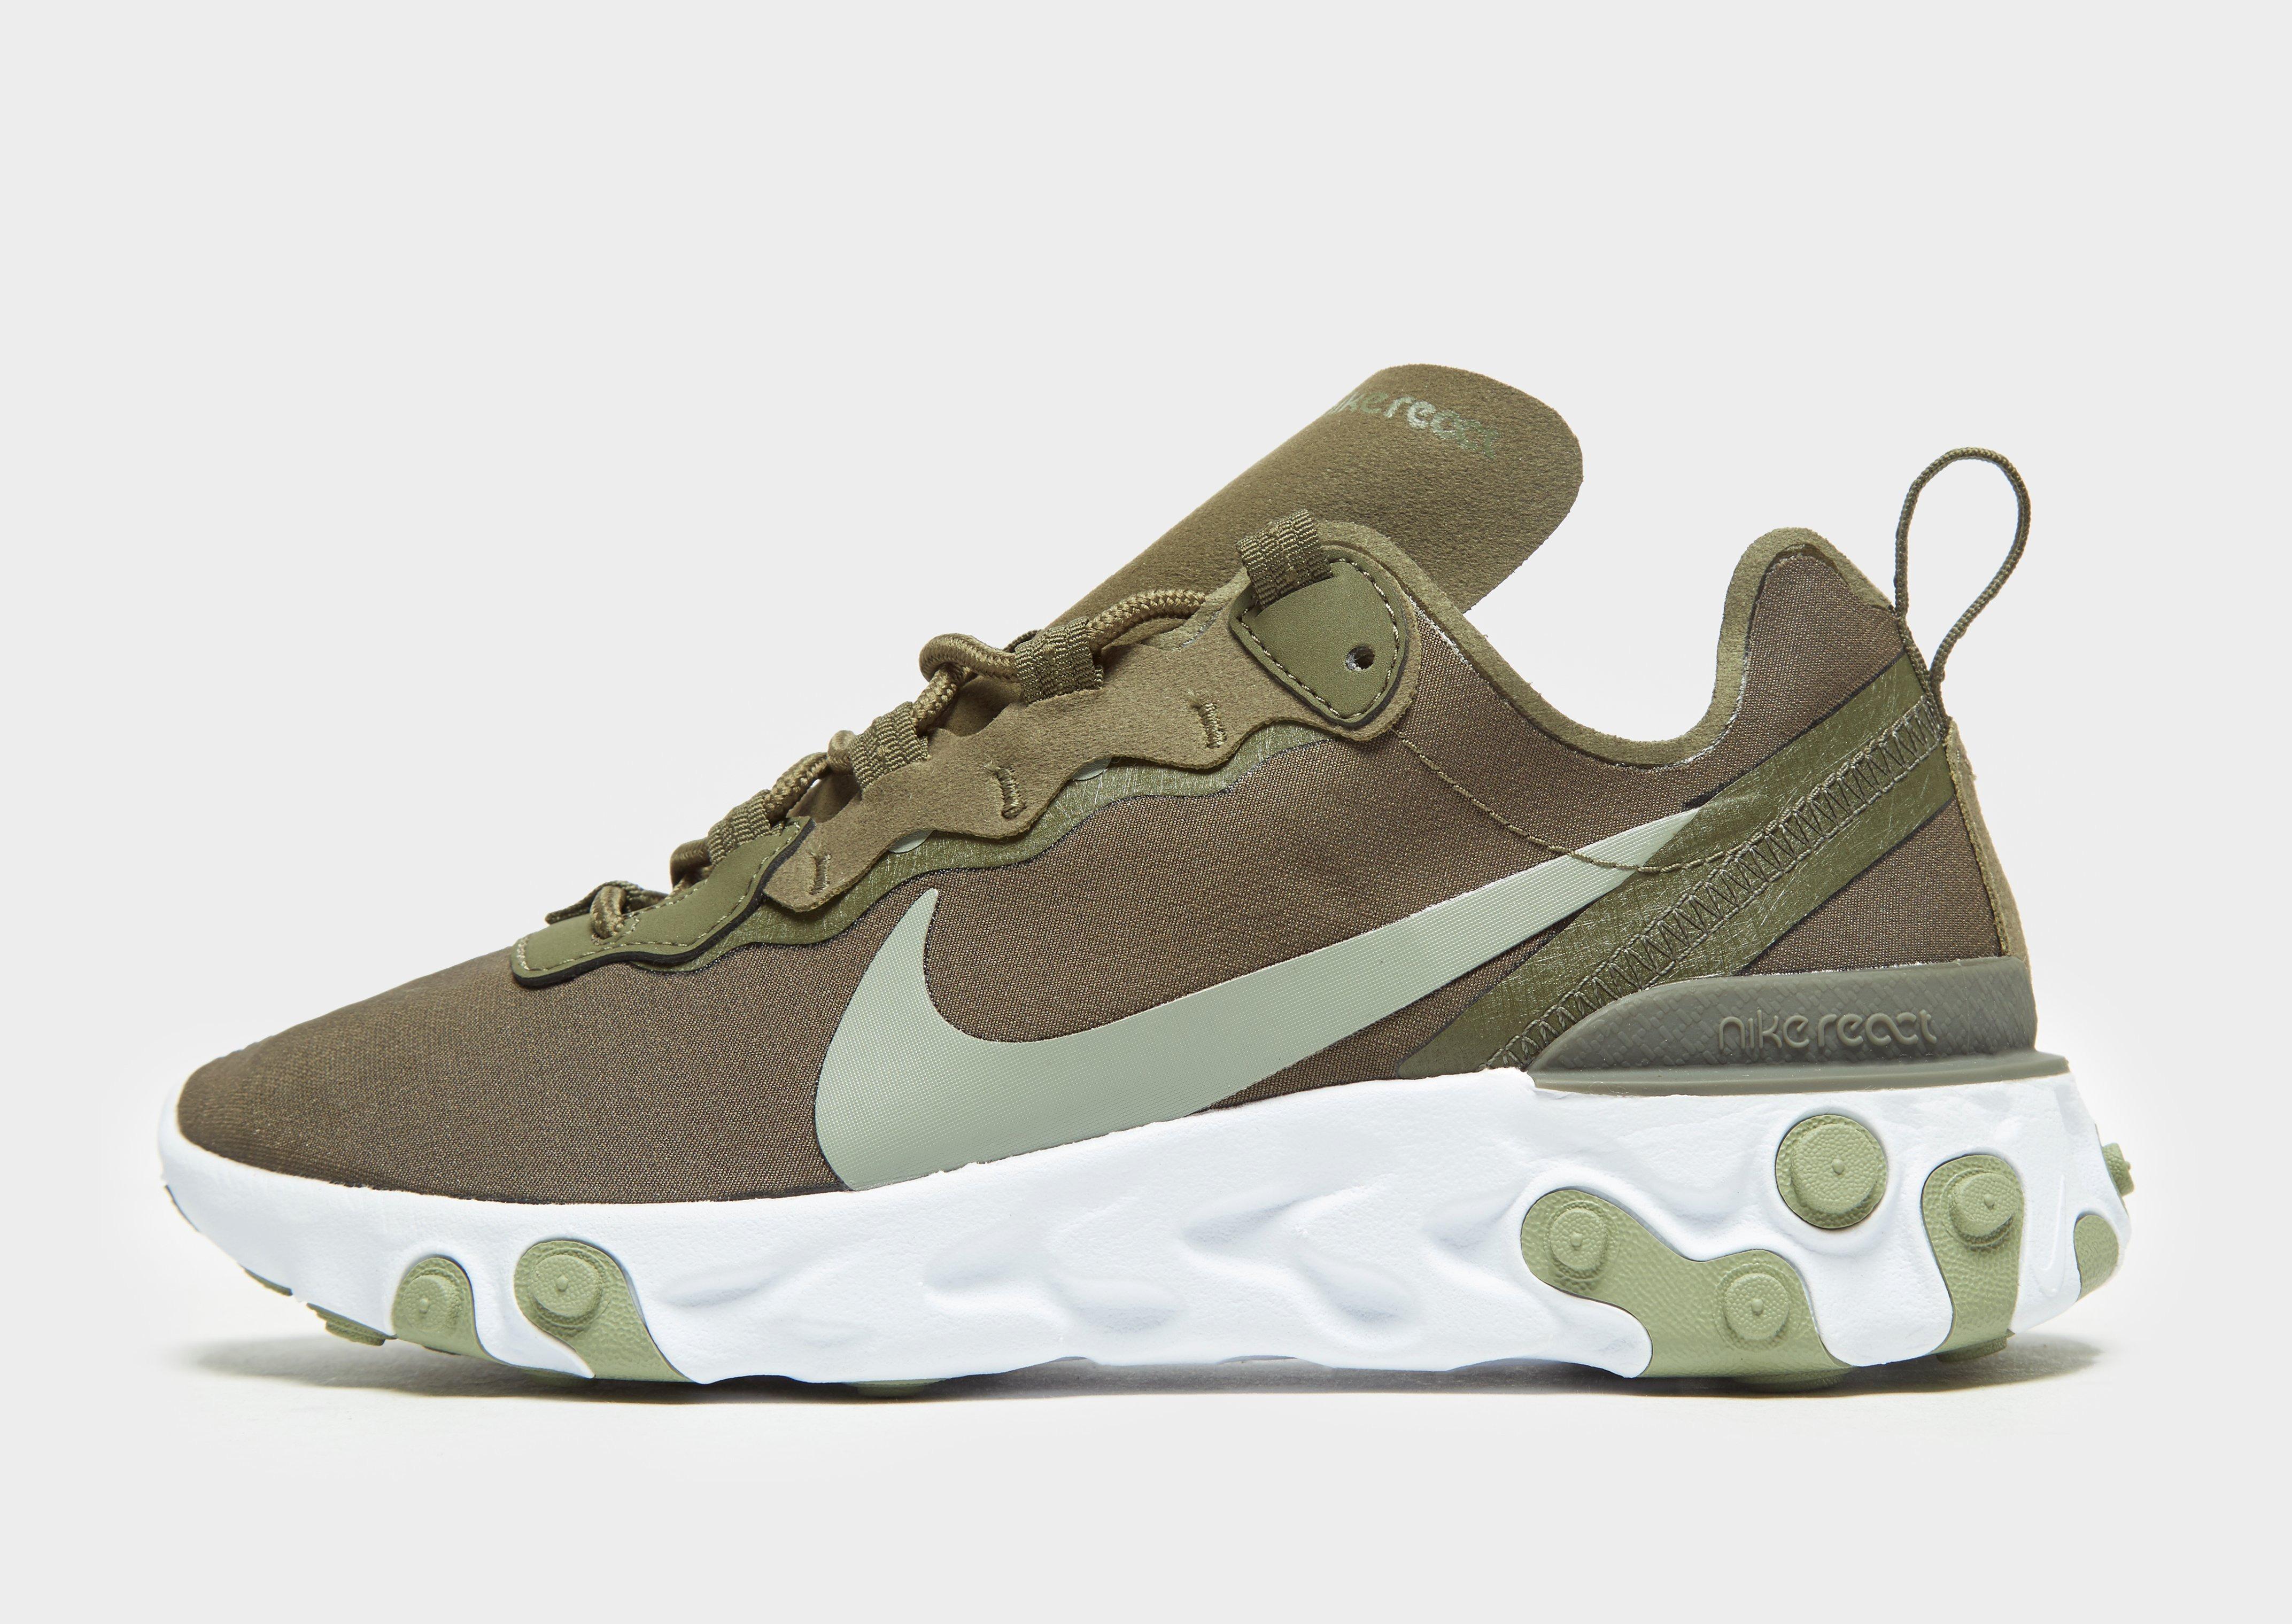 Nike Air Max 90 Herresko Camouflage Grøn Bund :